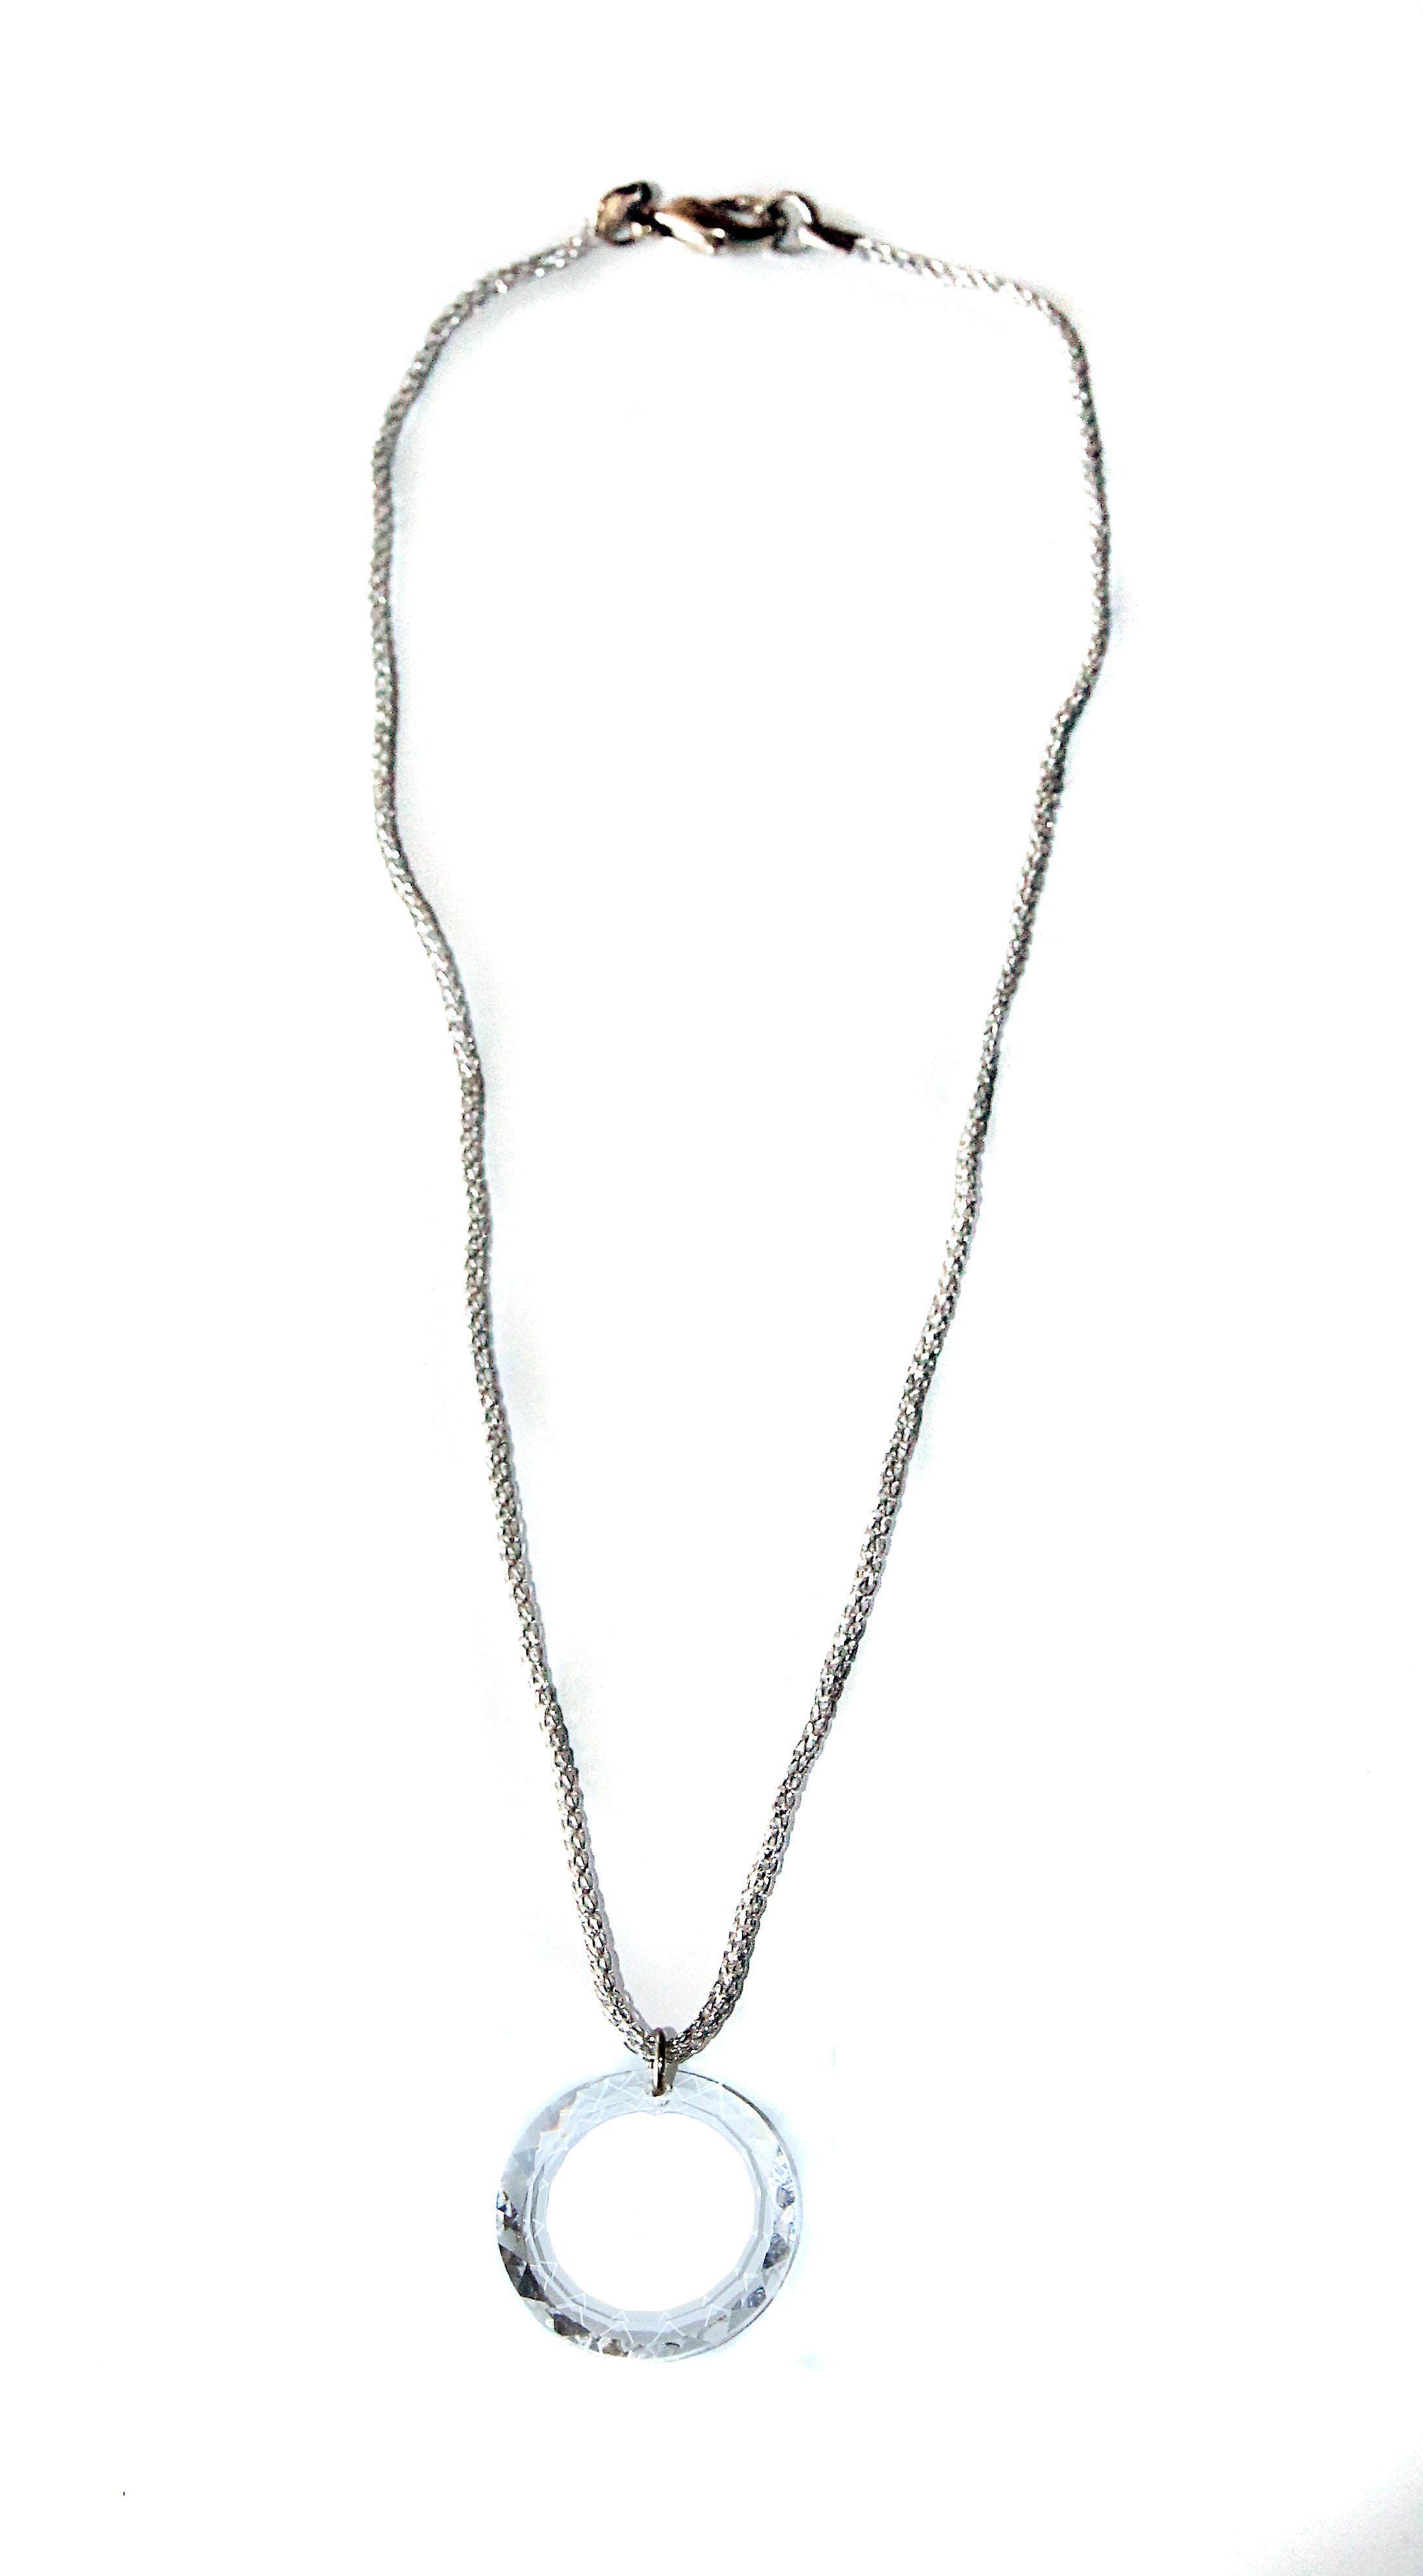 Waooh - Jewelry - Swarovski / Round pendant white cord - Silver